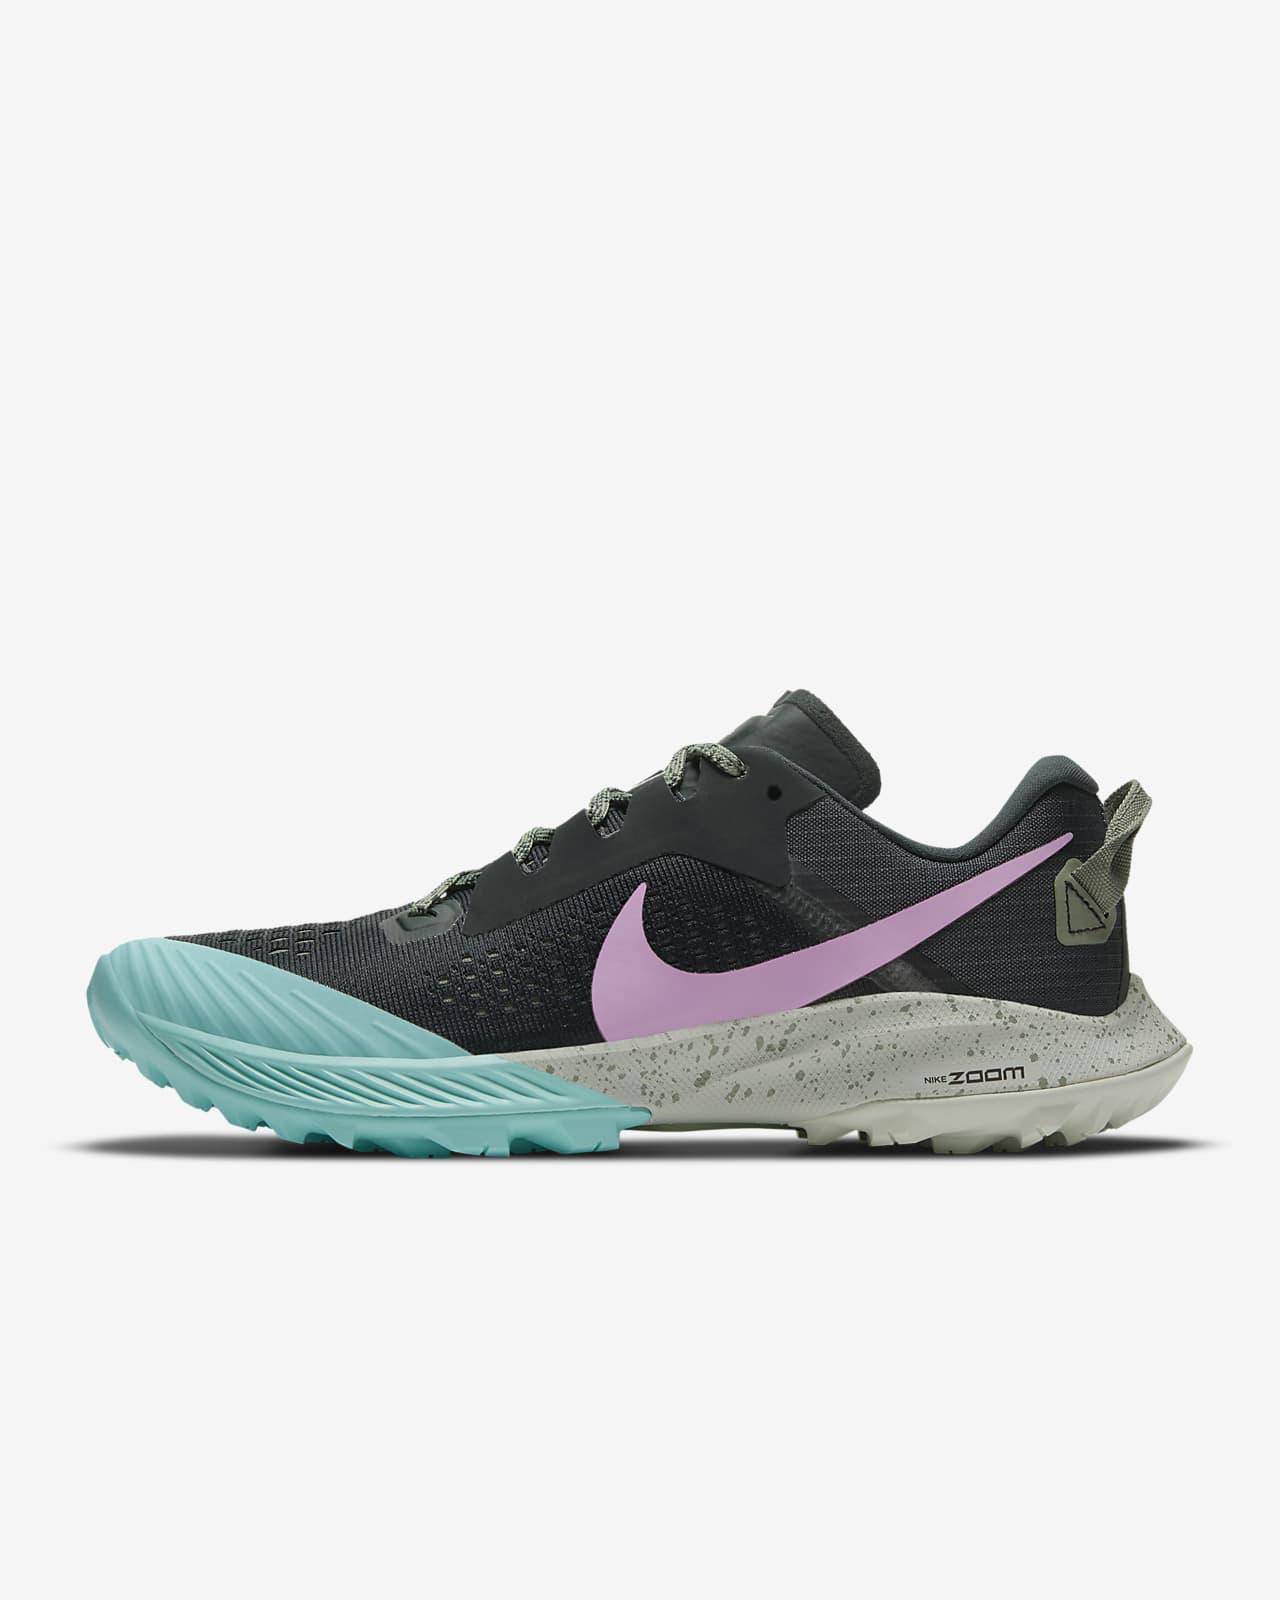 Nike Air Zoom Terra Kiger 6 Zapatillas de trail running - Mujer